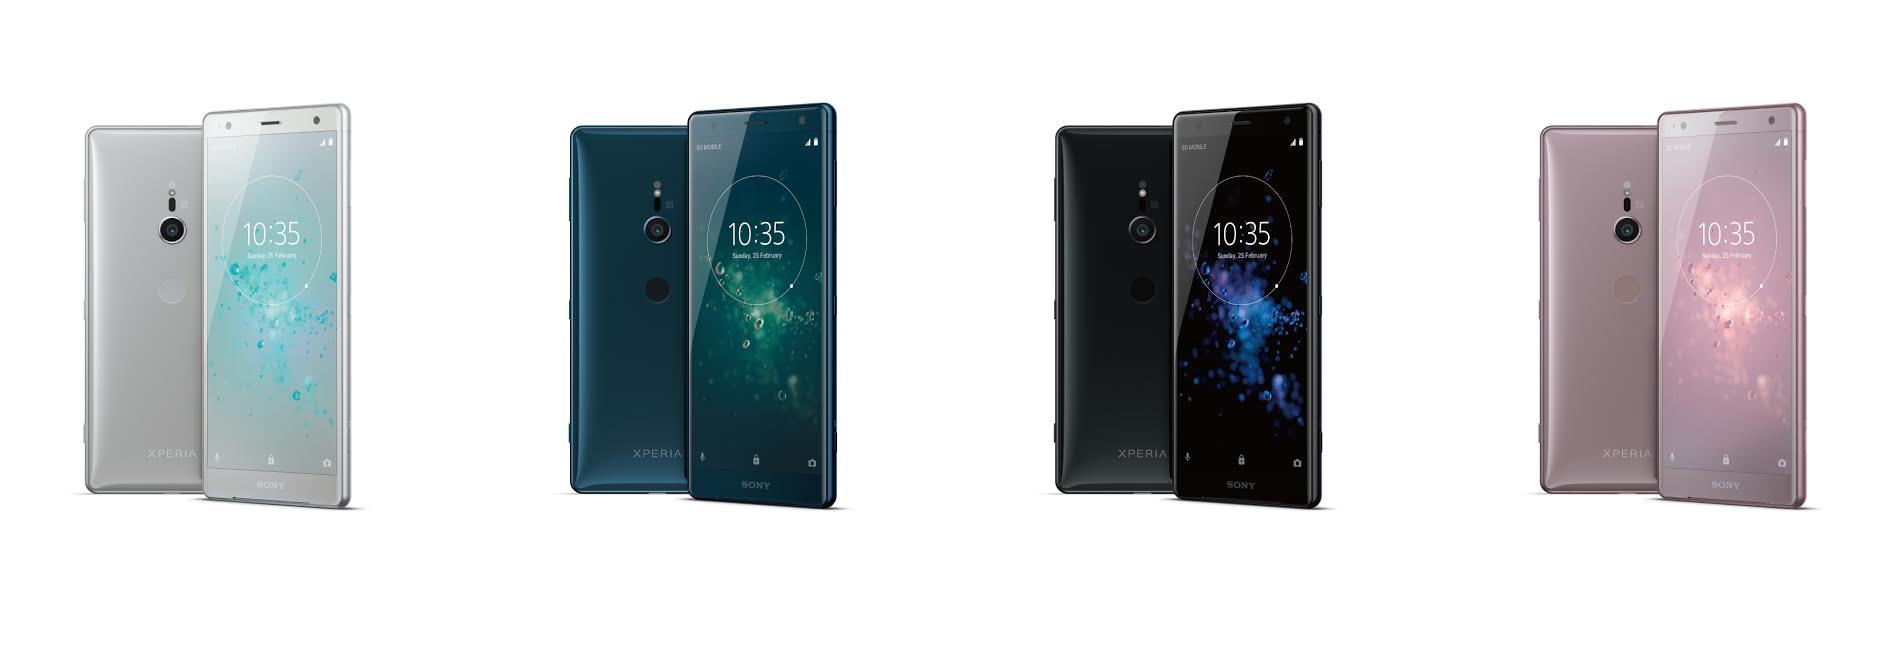 Xperia Design Evolution Sony Mobile 當代設計經典 清新雋永 Xperia 原創手機設計美學 2018 全新展開 @3C 達人廖阿輝